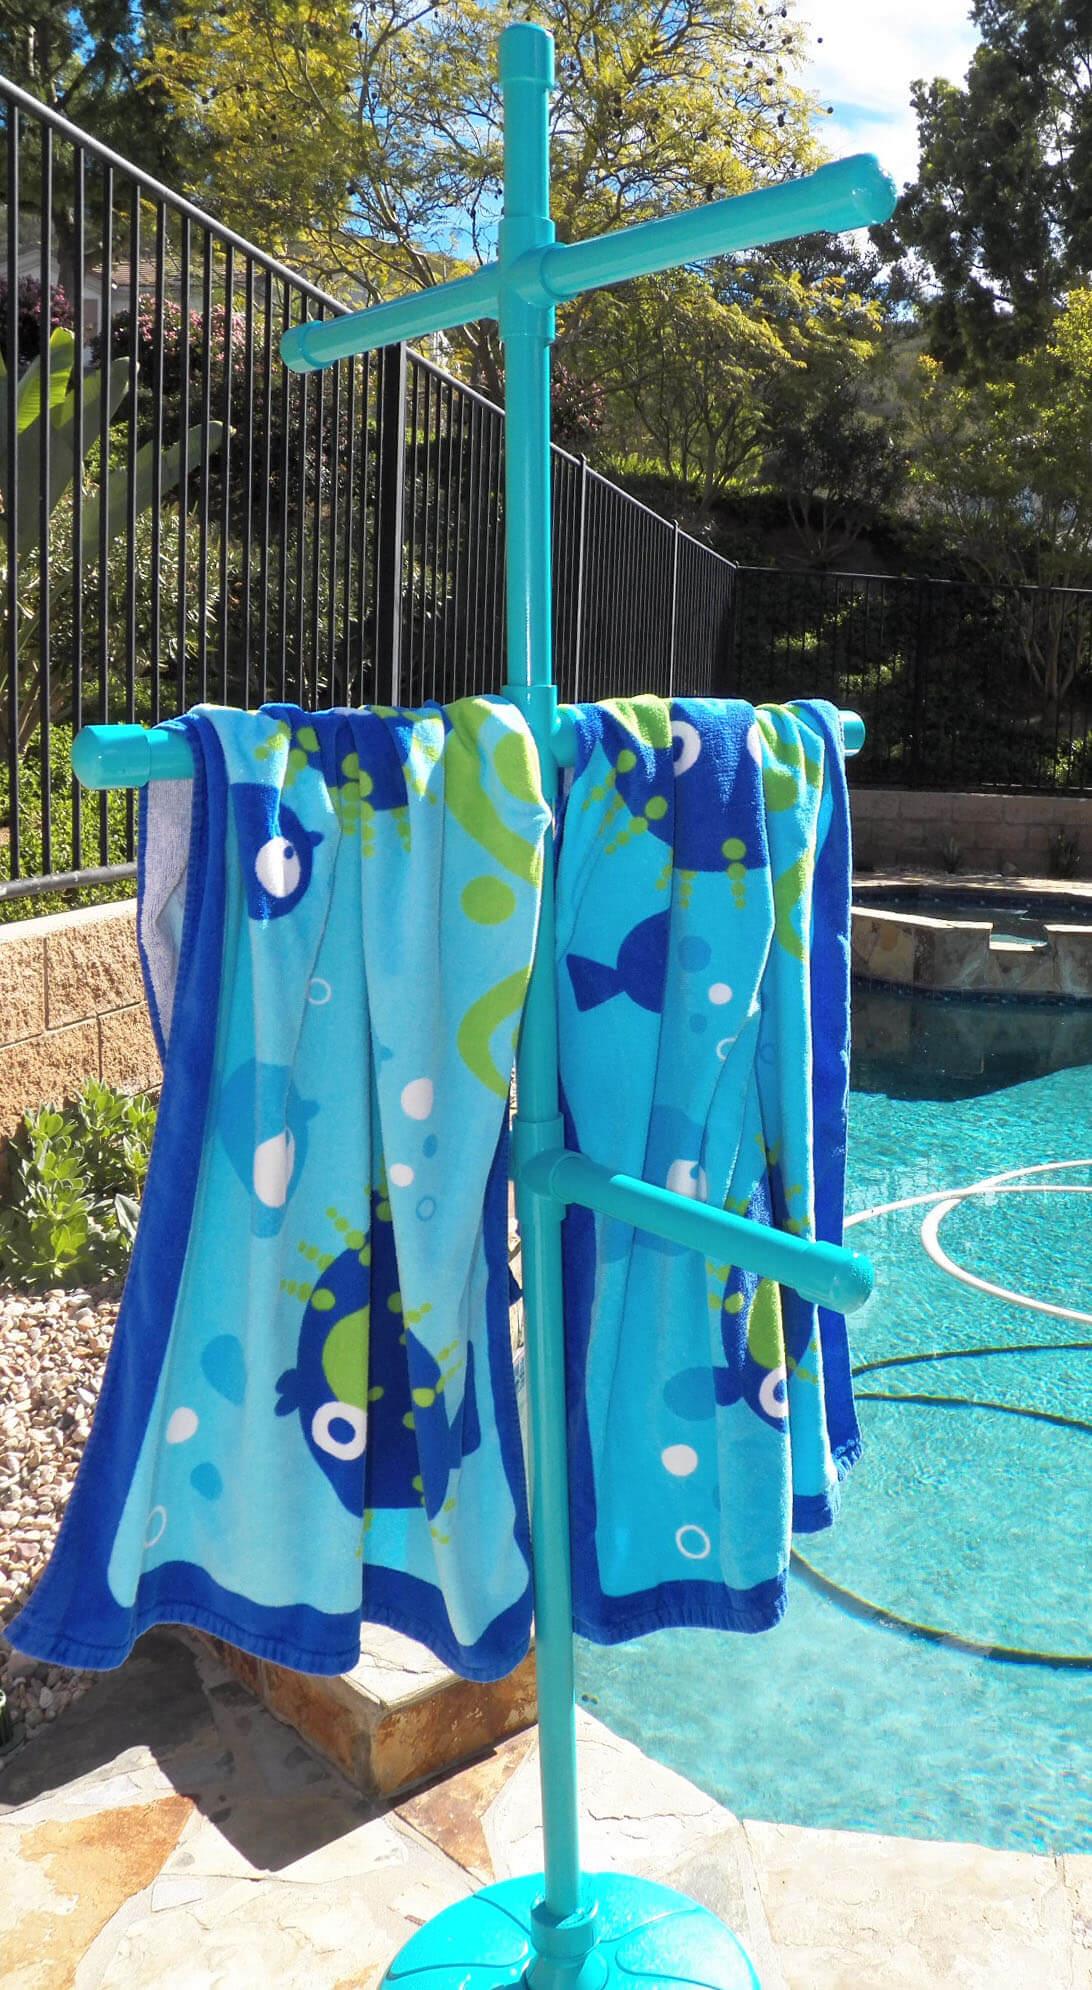 Colorful DIY Towel Tree